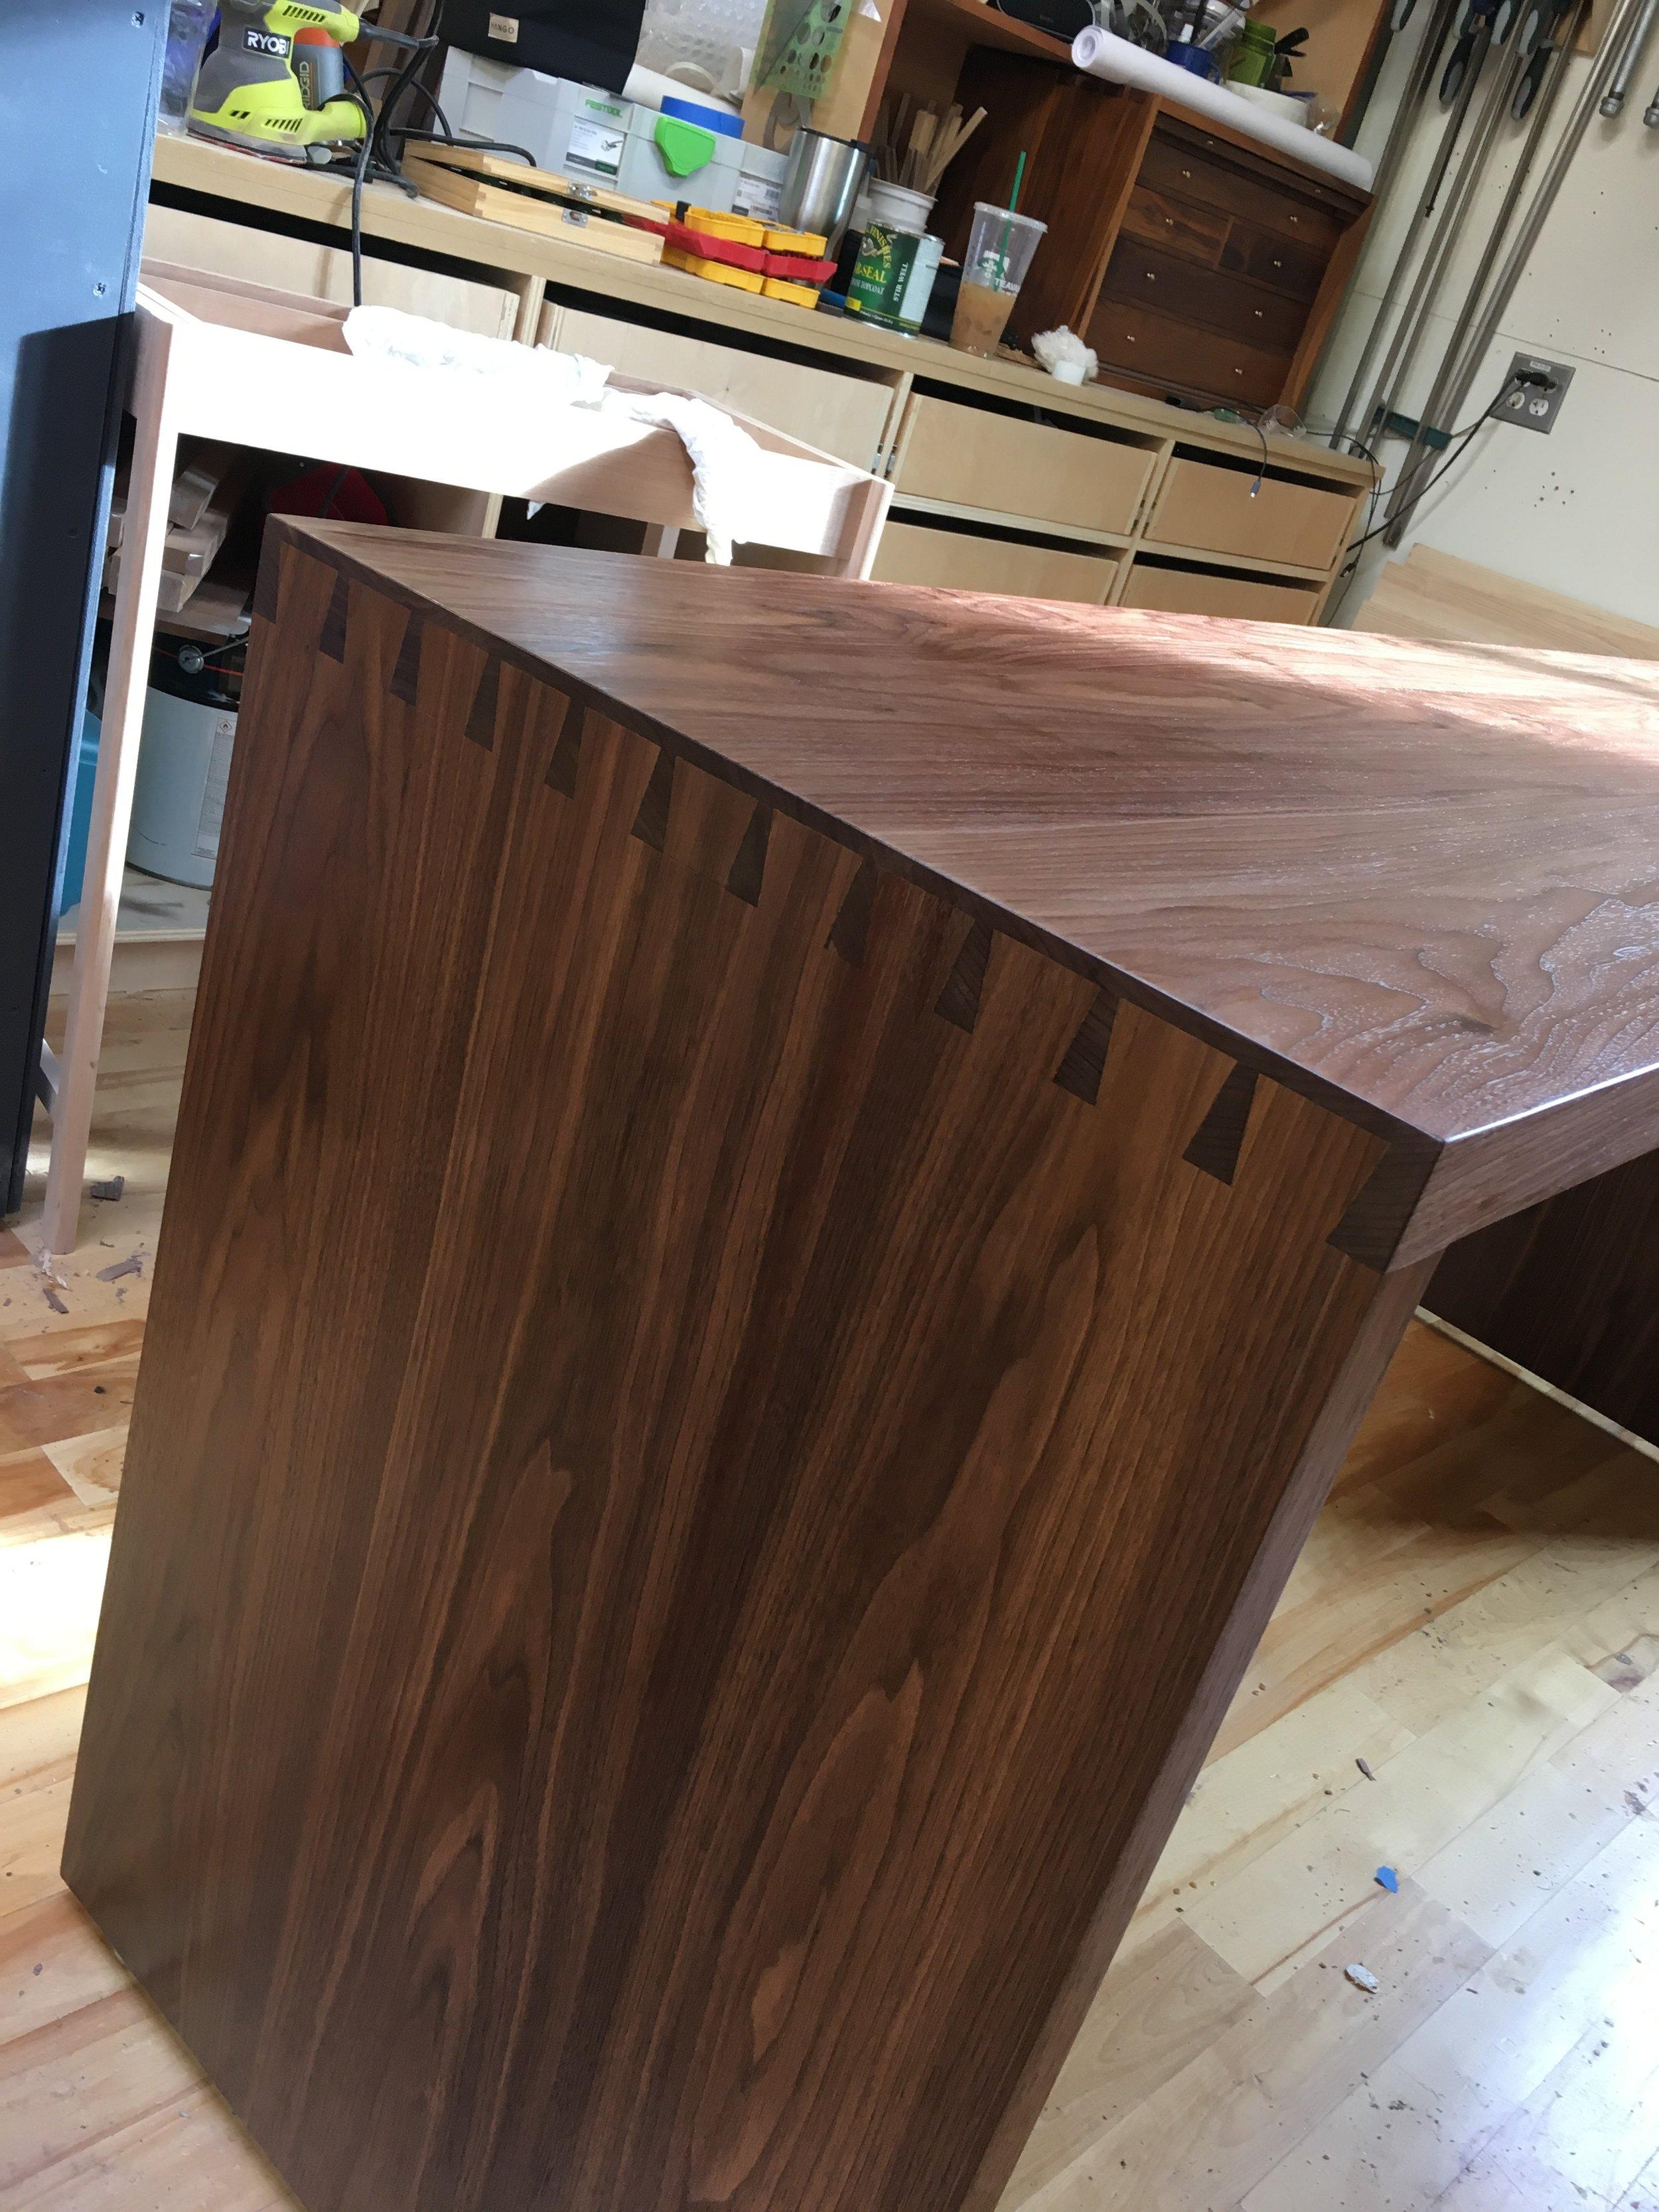 Hone Design Co._Wellesley Desk Process 12